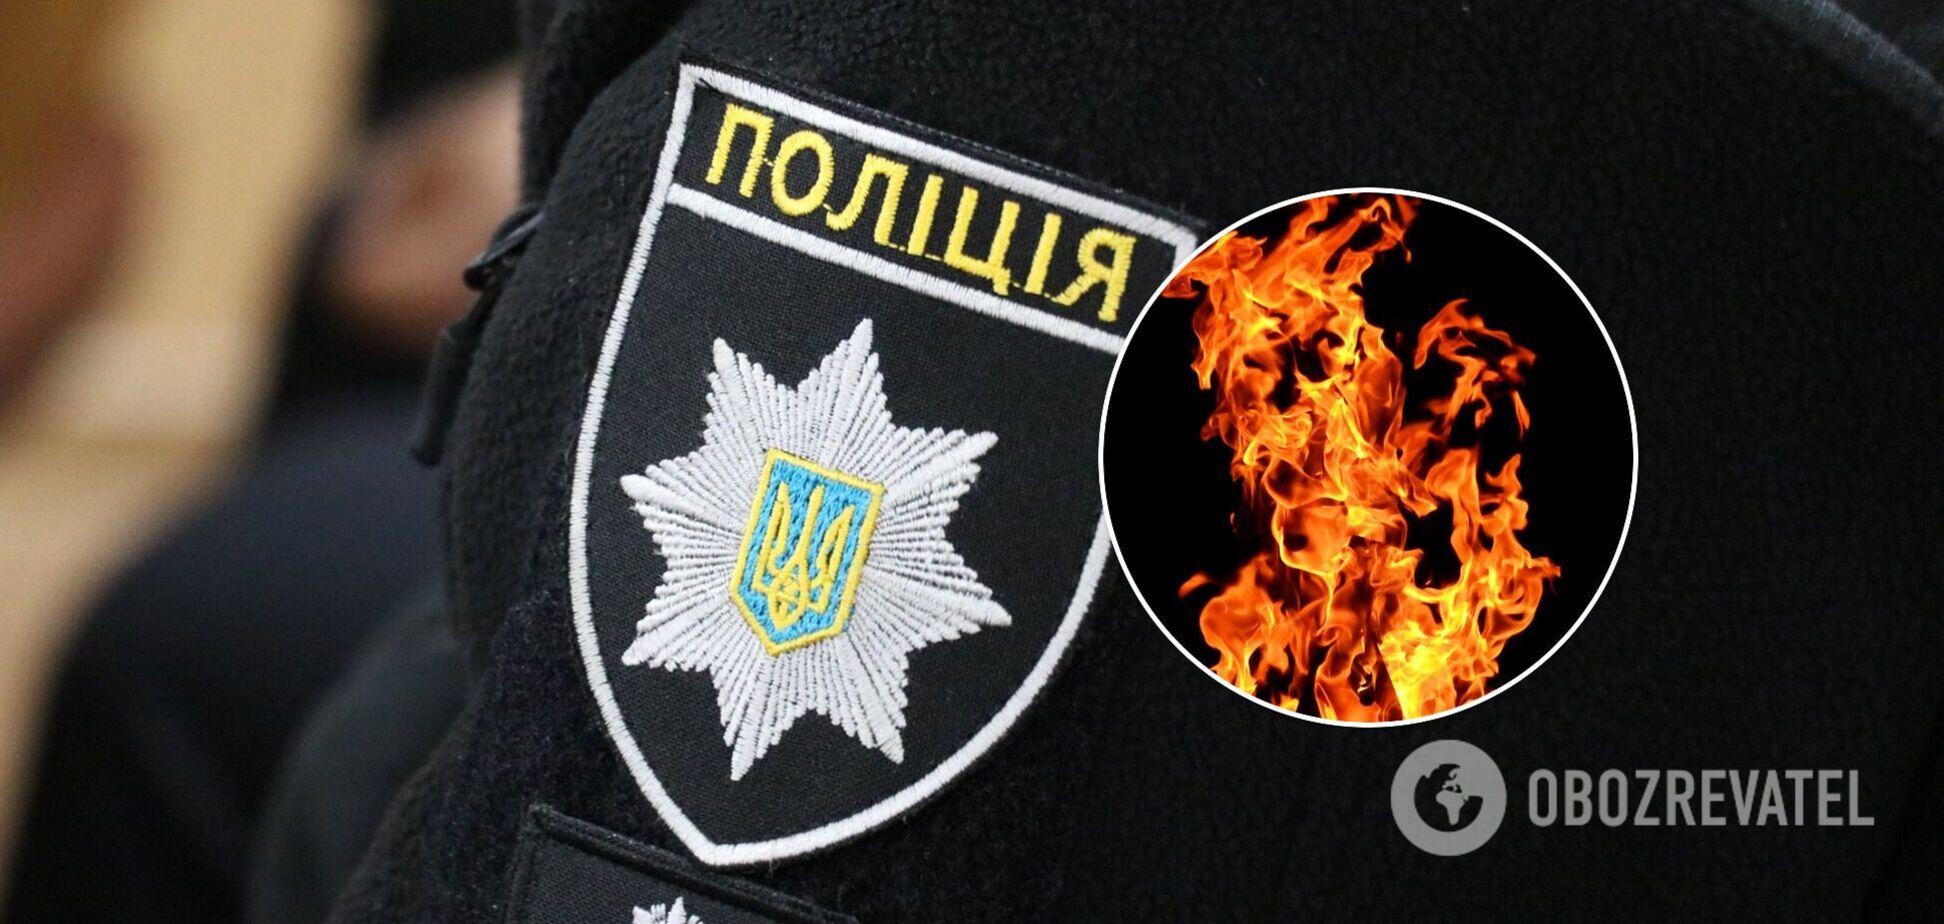 Полиция поймала подозреваемого в поджоге